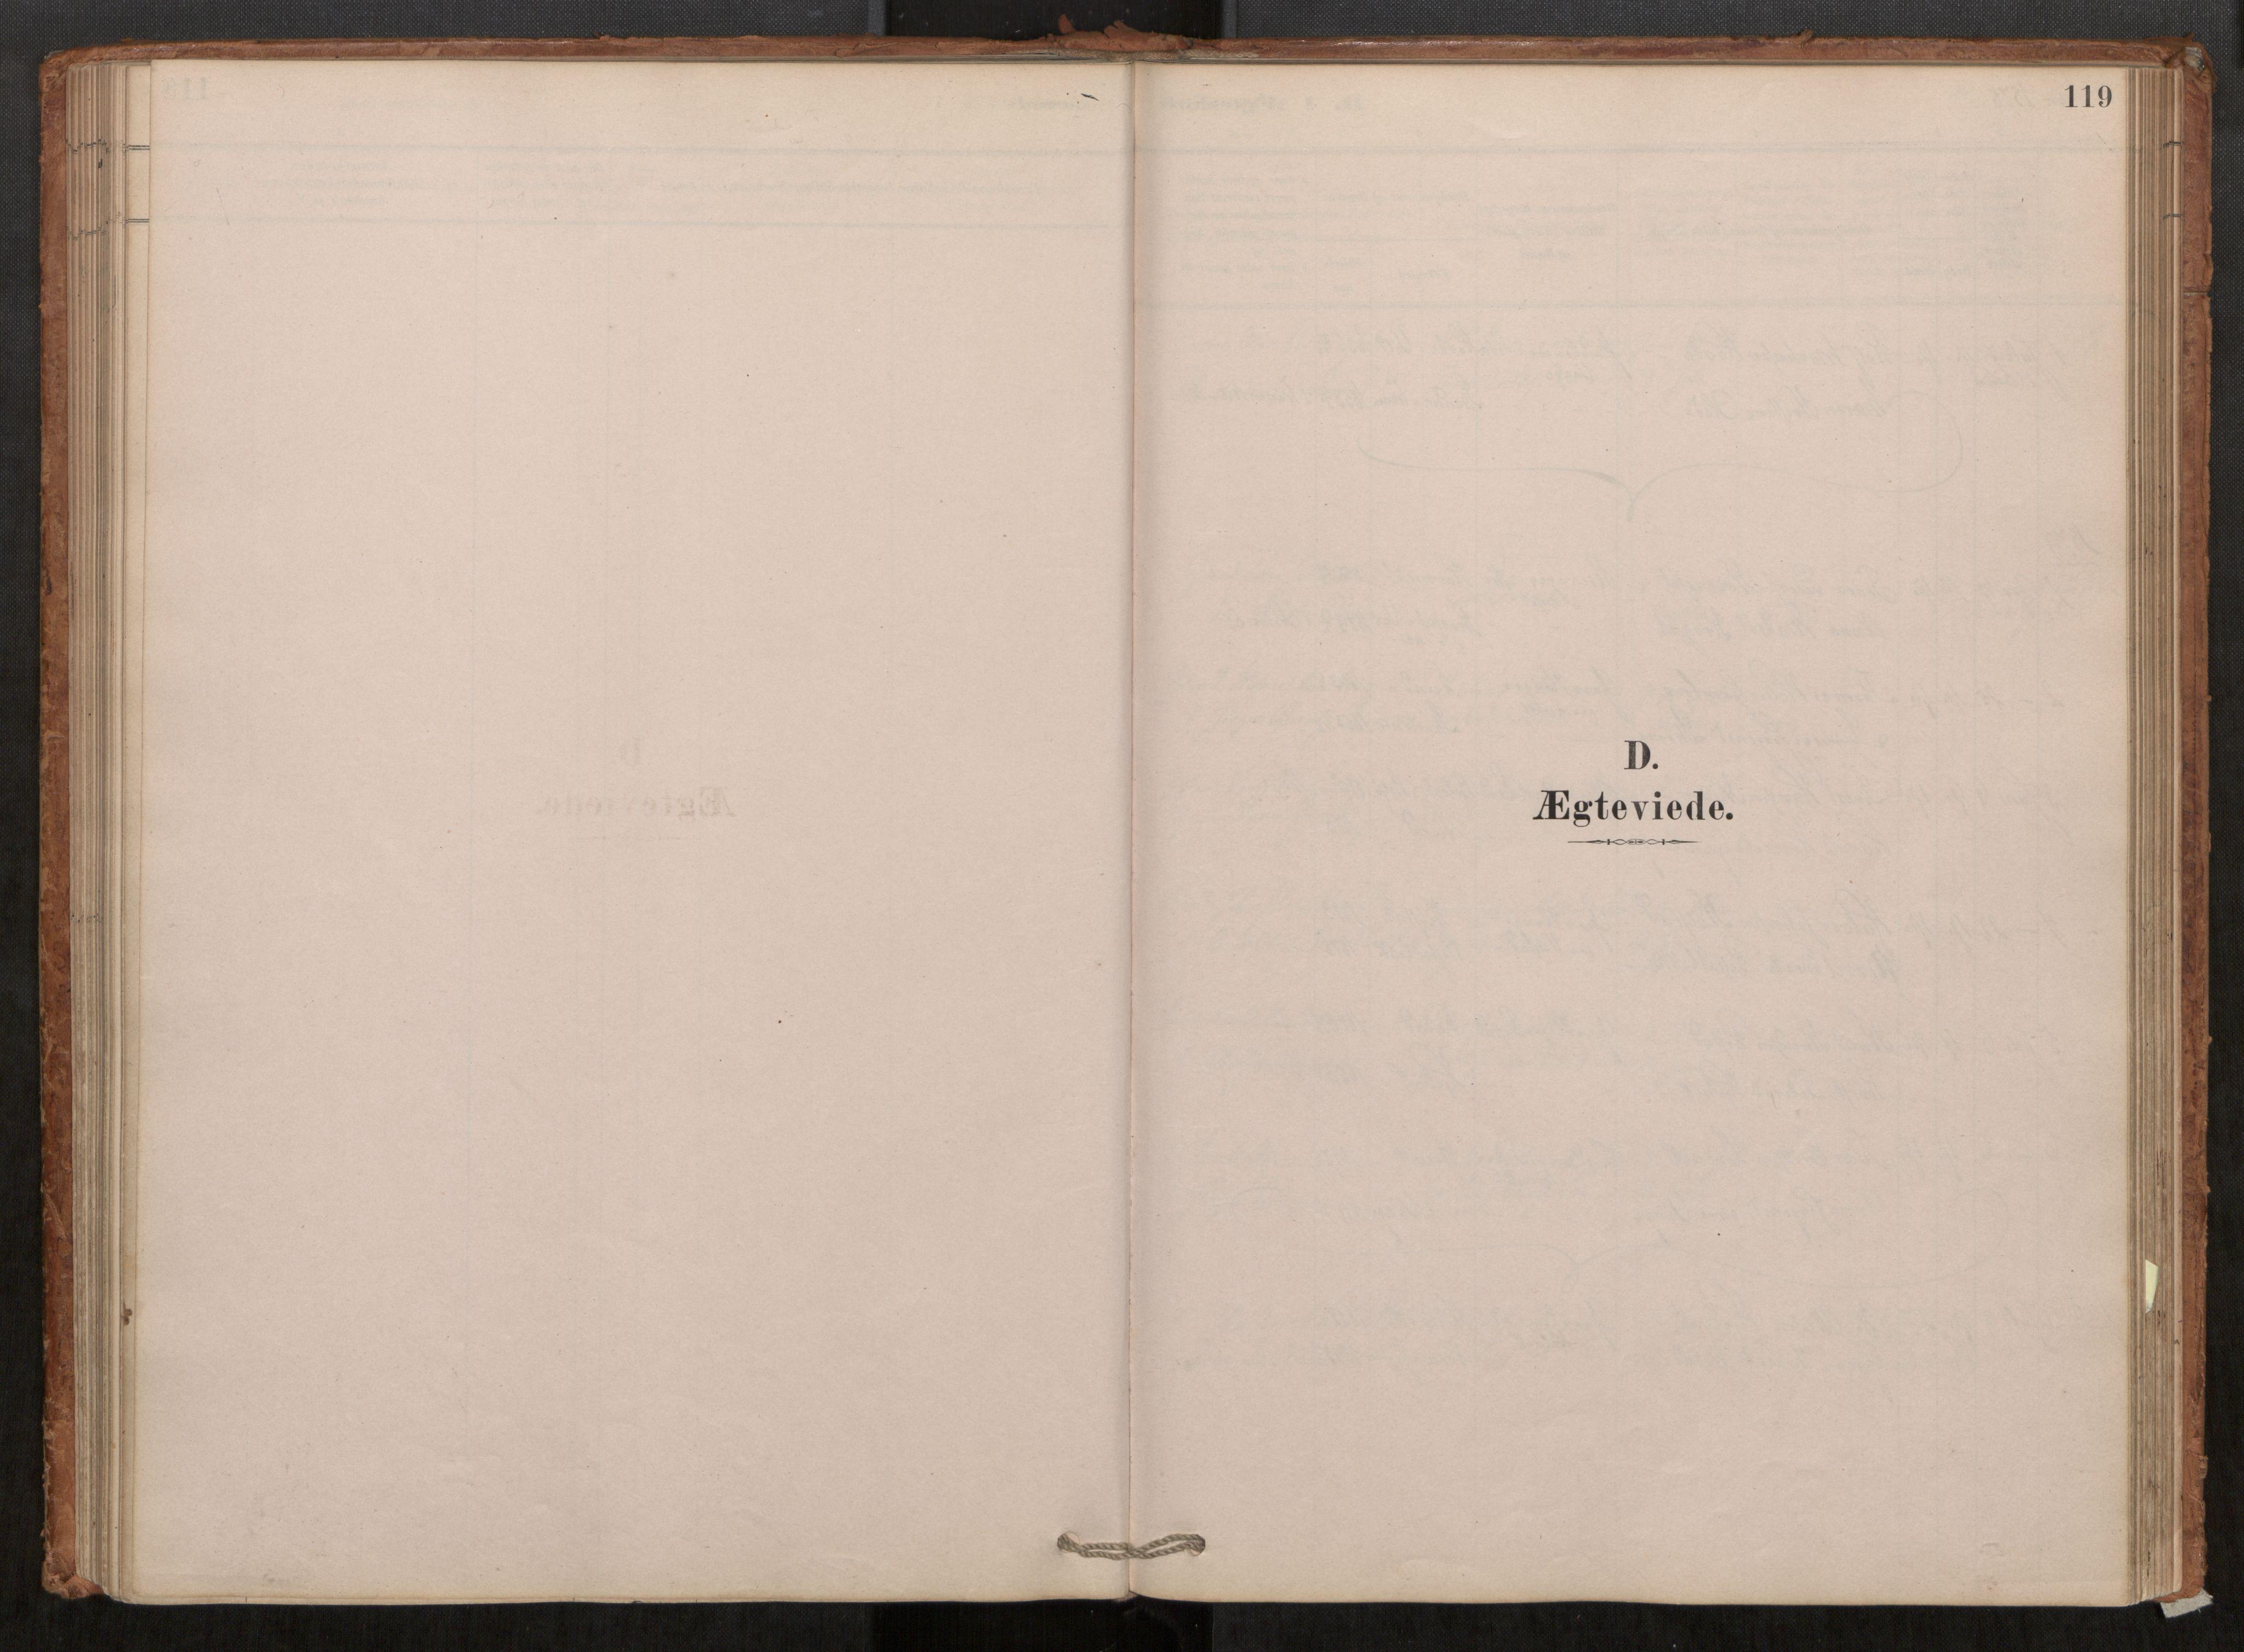 SAT, Grytten sokneprestkontor, Ministerialbok nr. 550A01, 1878-1915, s. 119